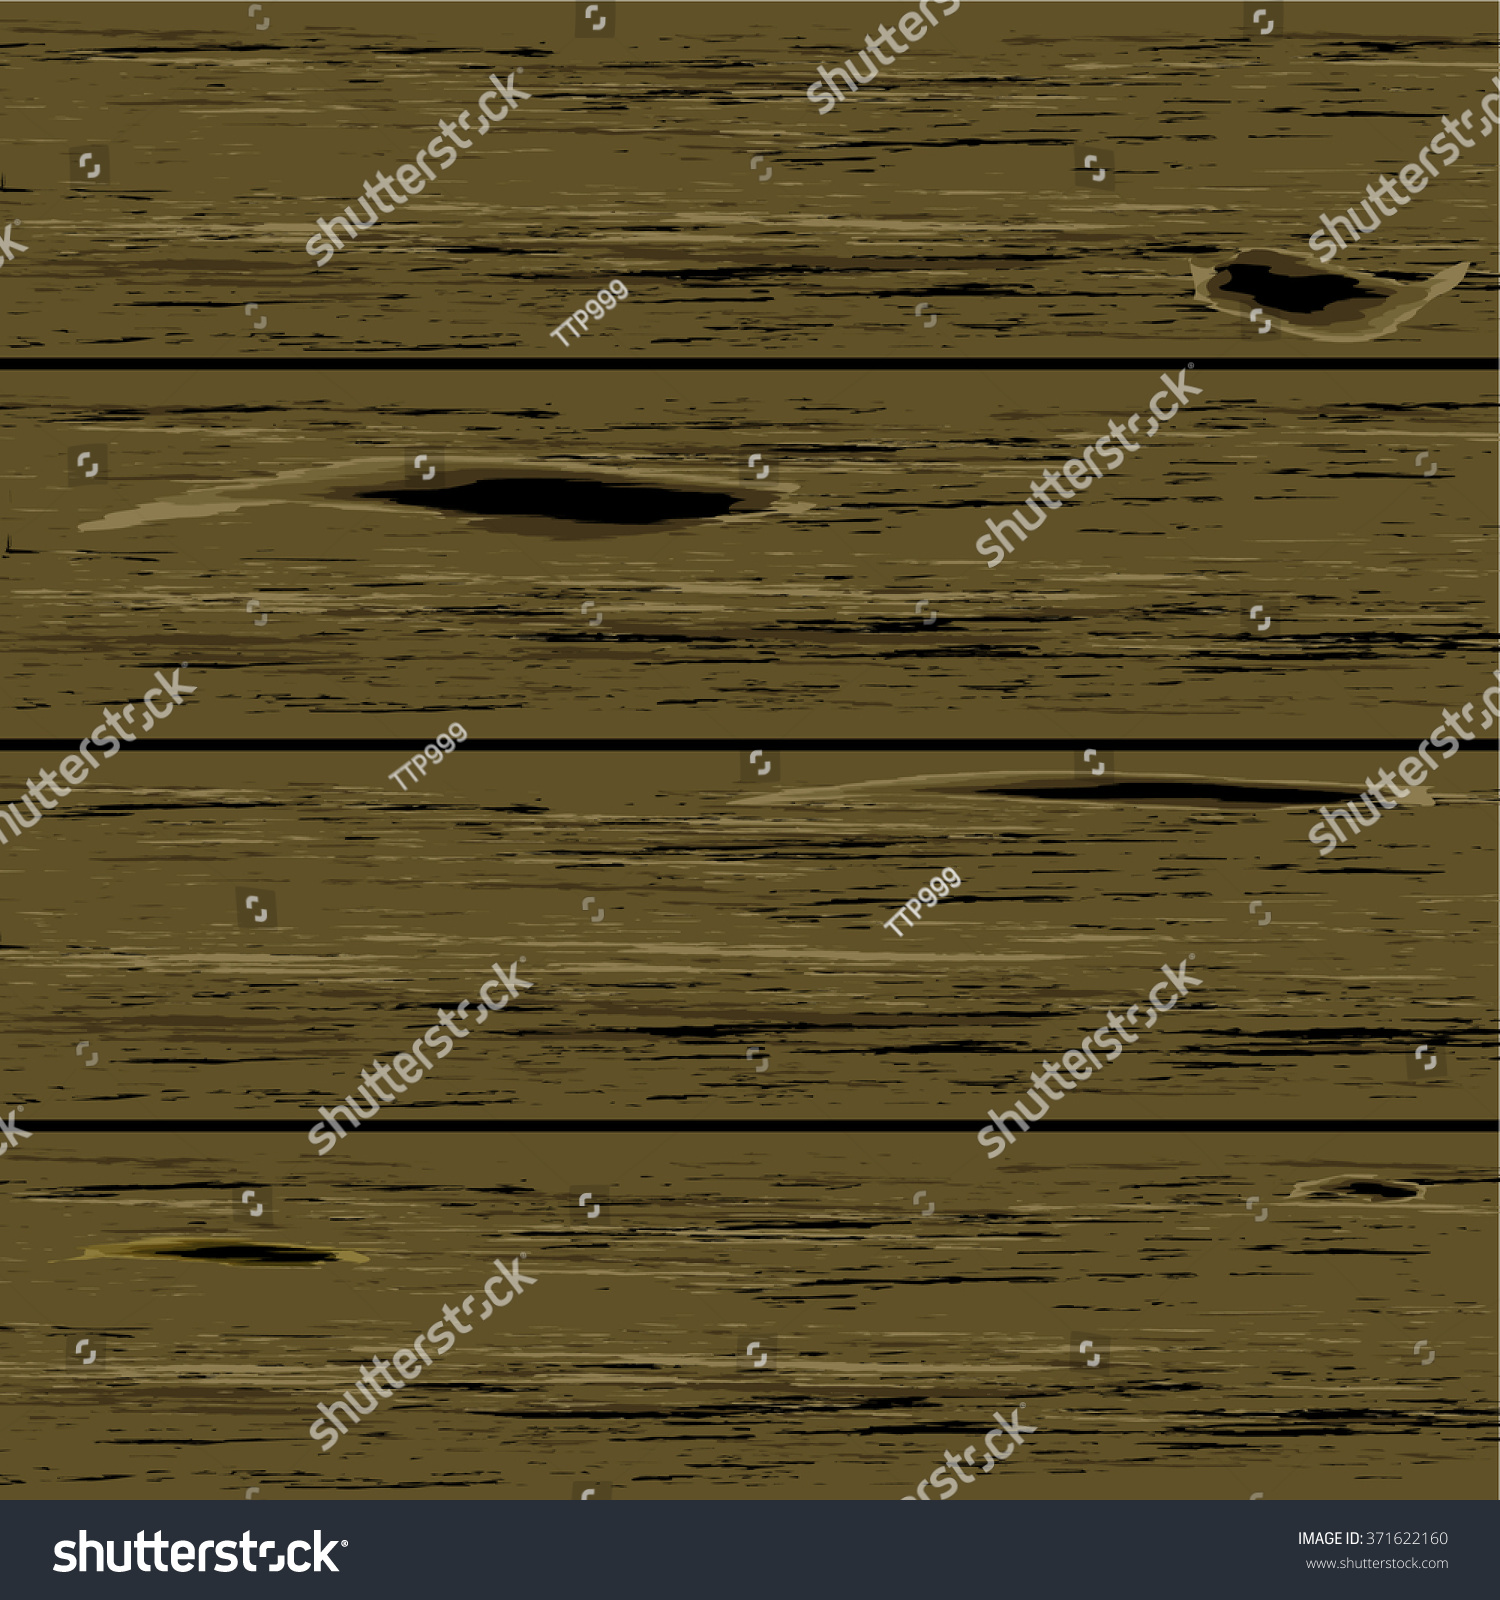 horizontal wood background. Wood Texture. Horizontal Wooden Background. Vector Illustration Background